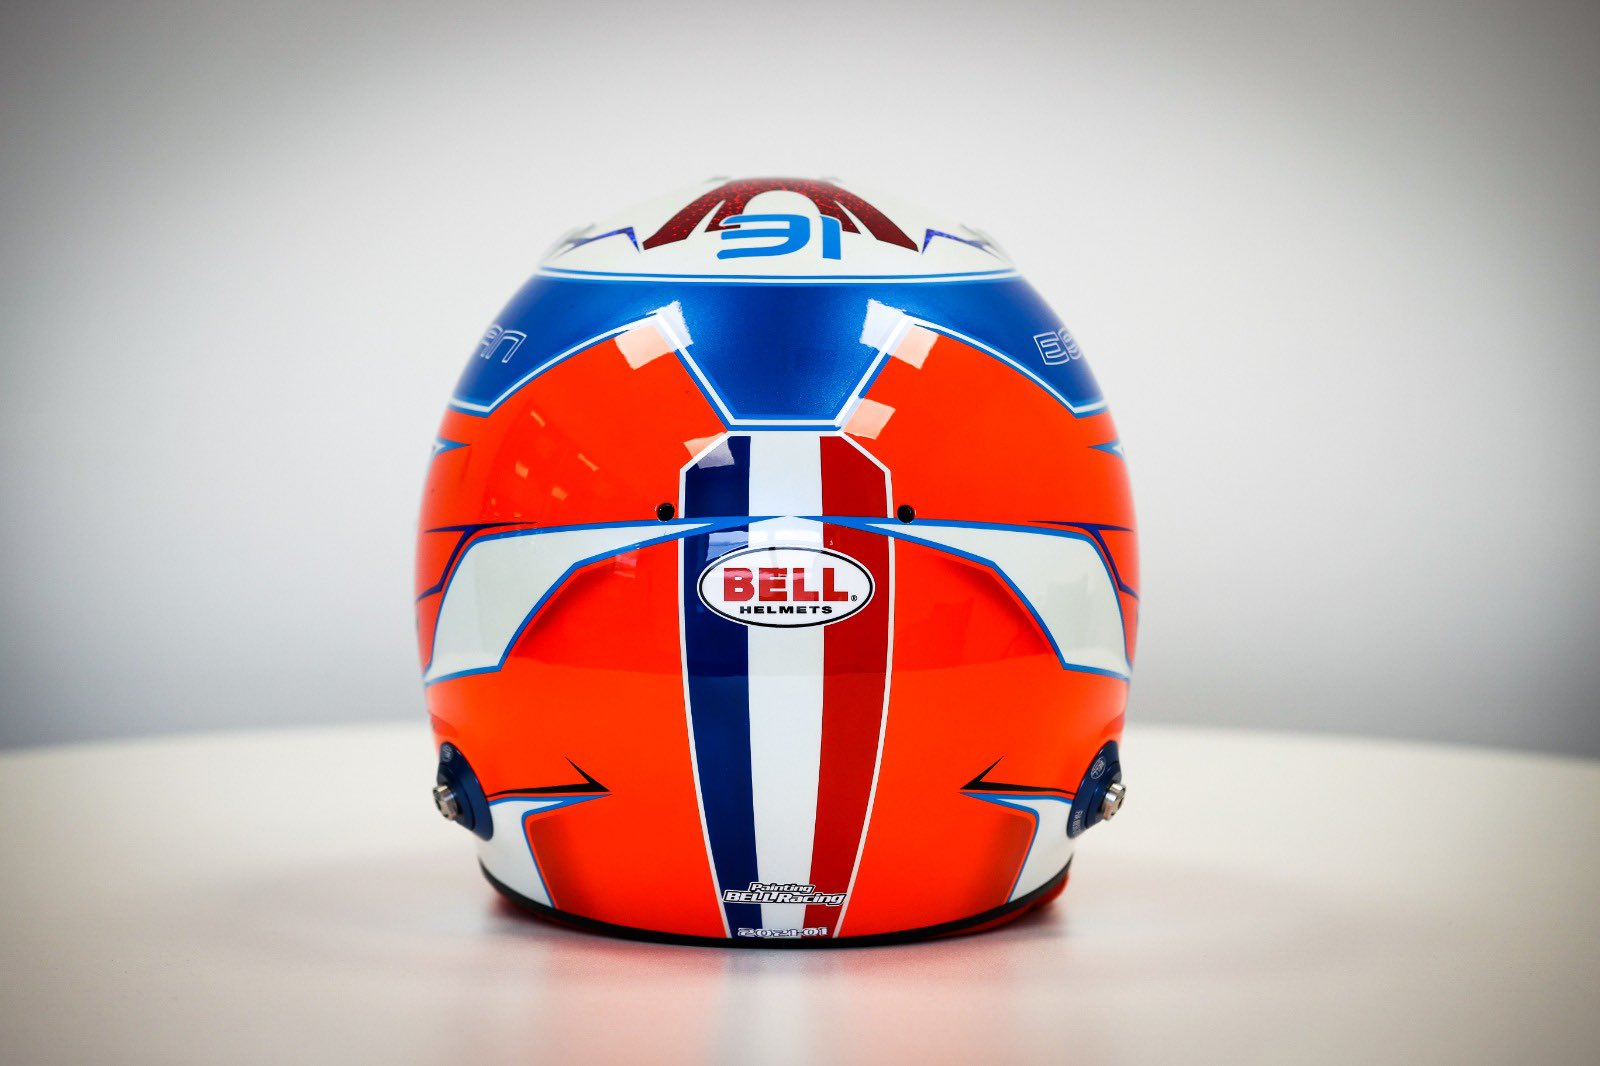 Formel 1 Helm 2021 Ocon